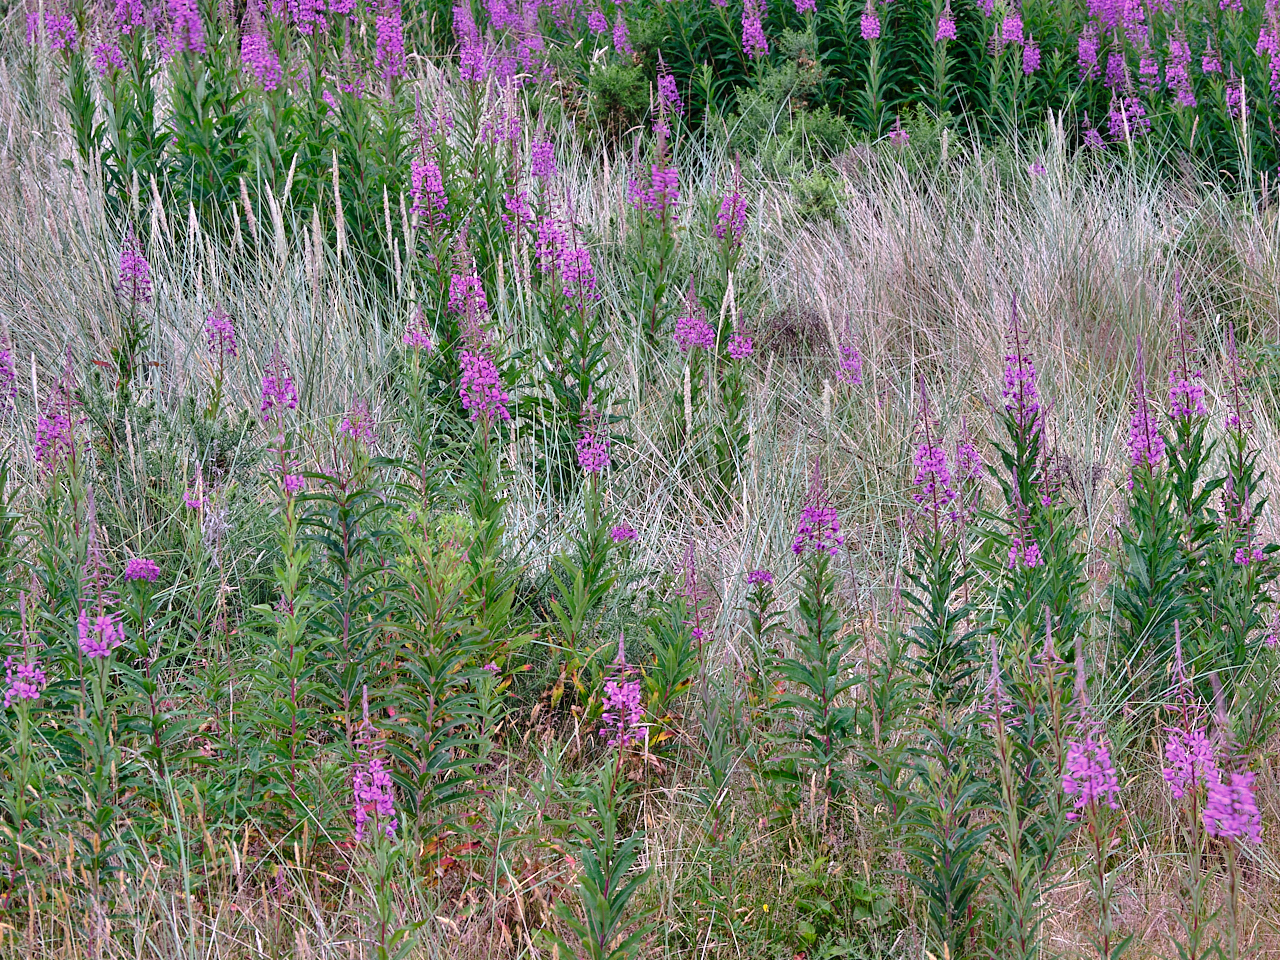 Rosebay Willowherb – Chamerion angustifolium